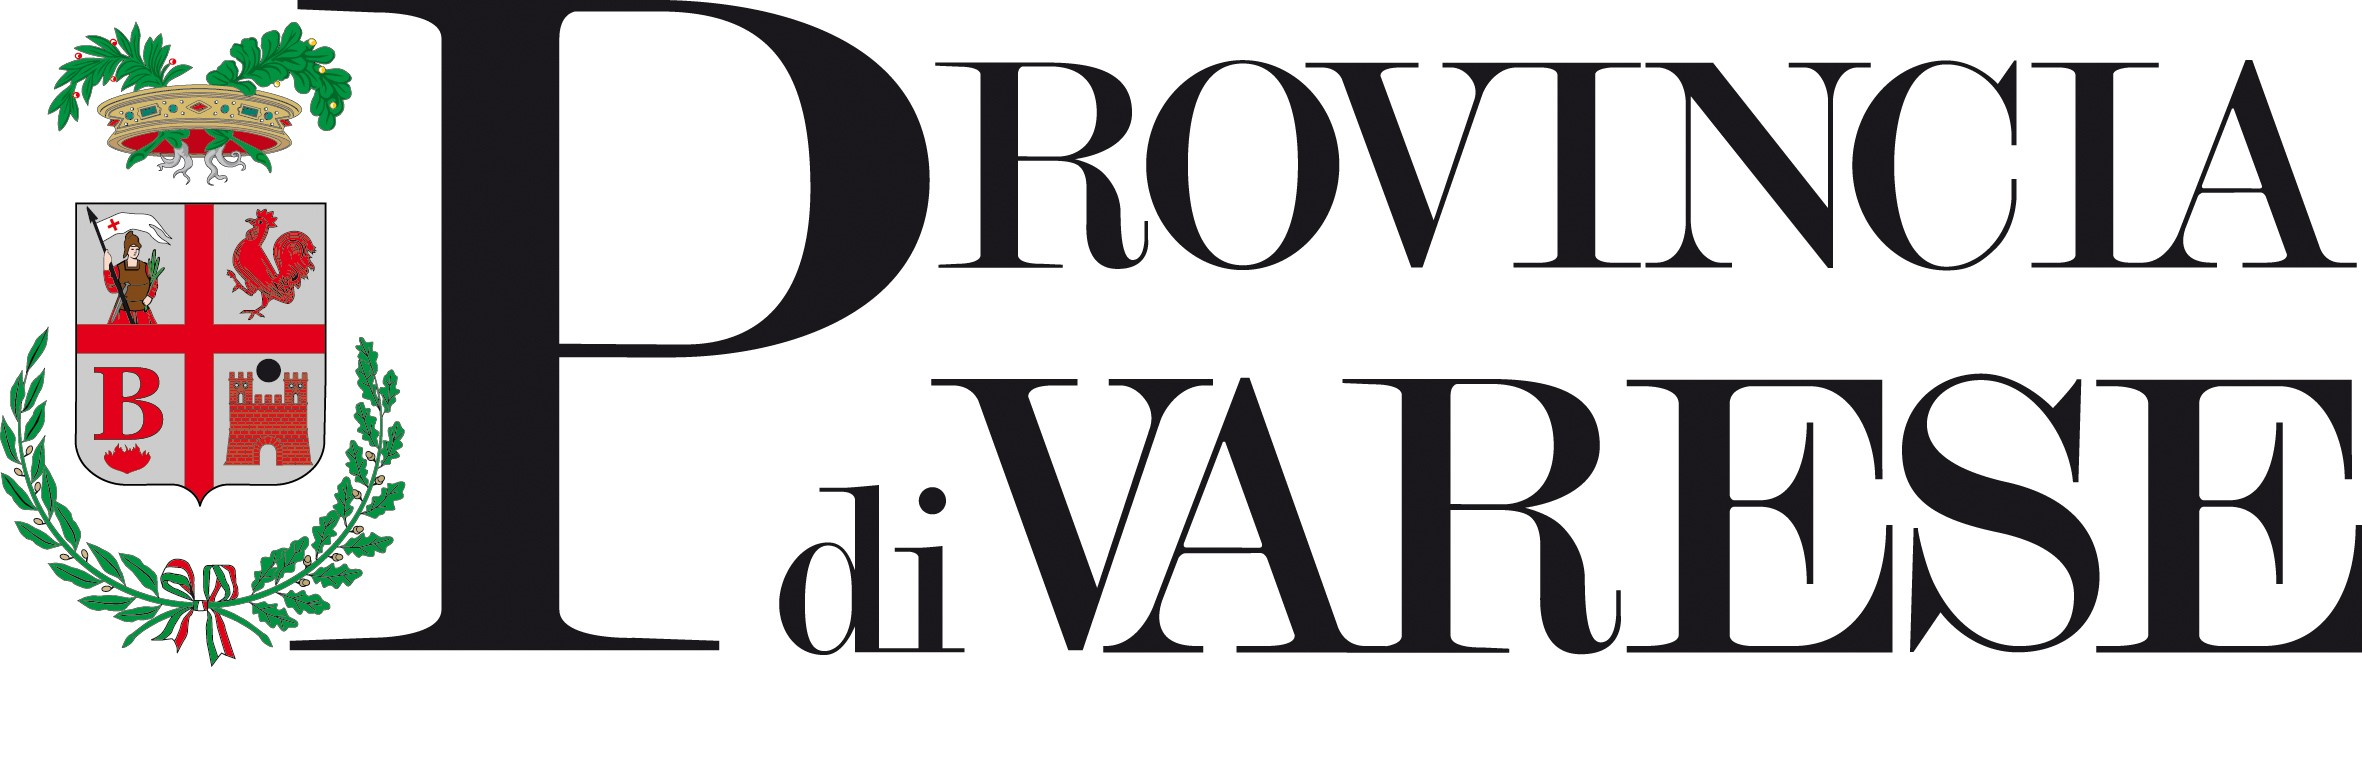 Provincia Varese